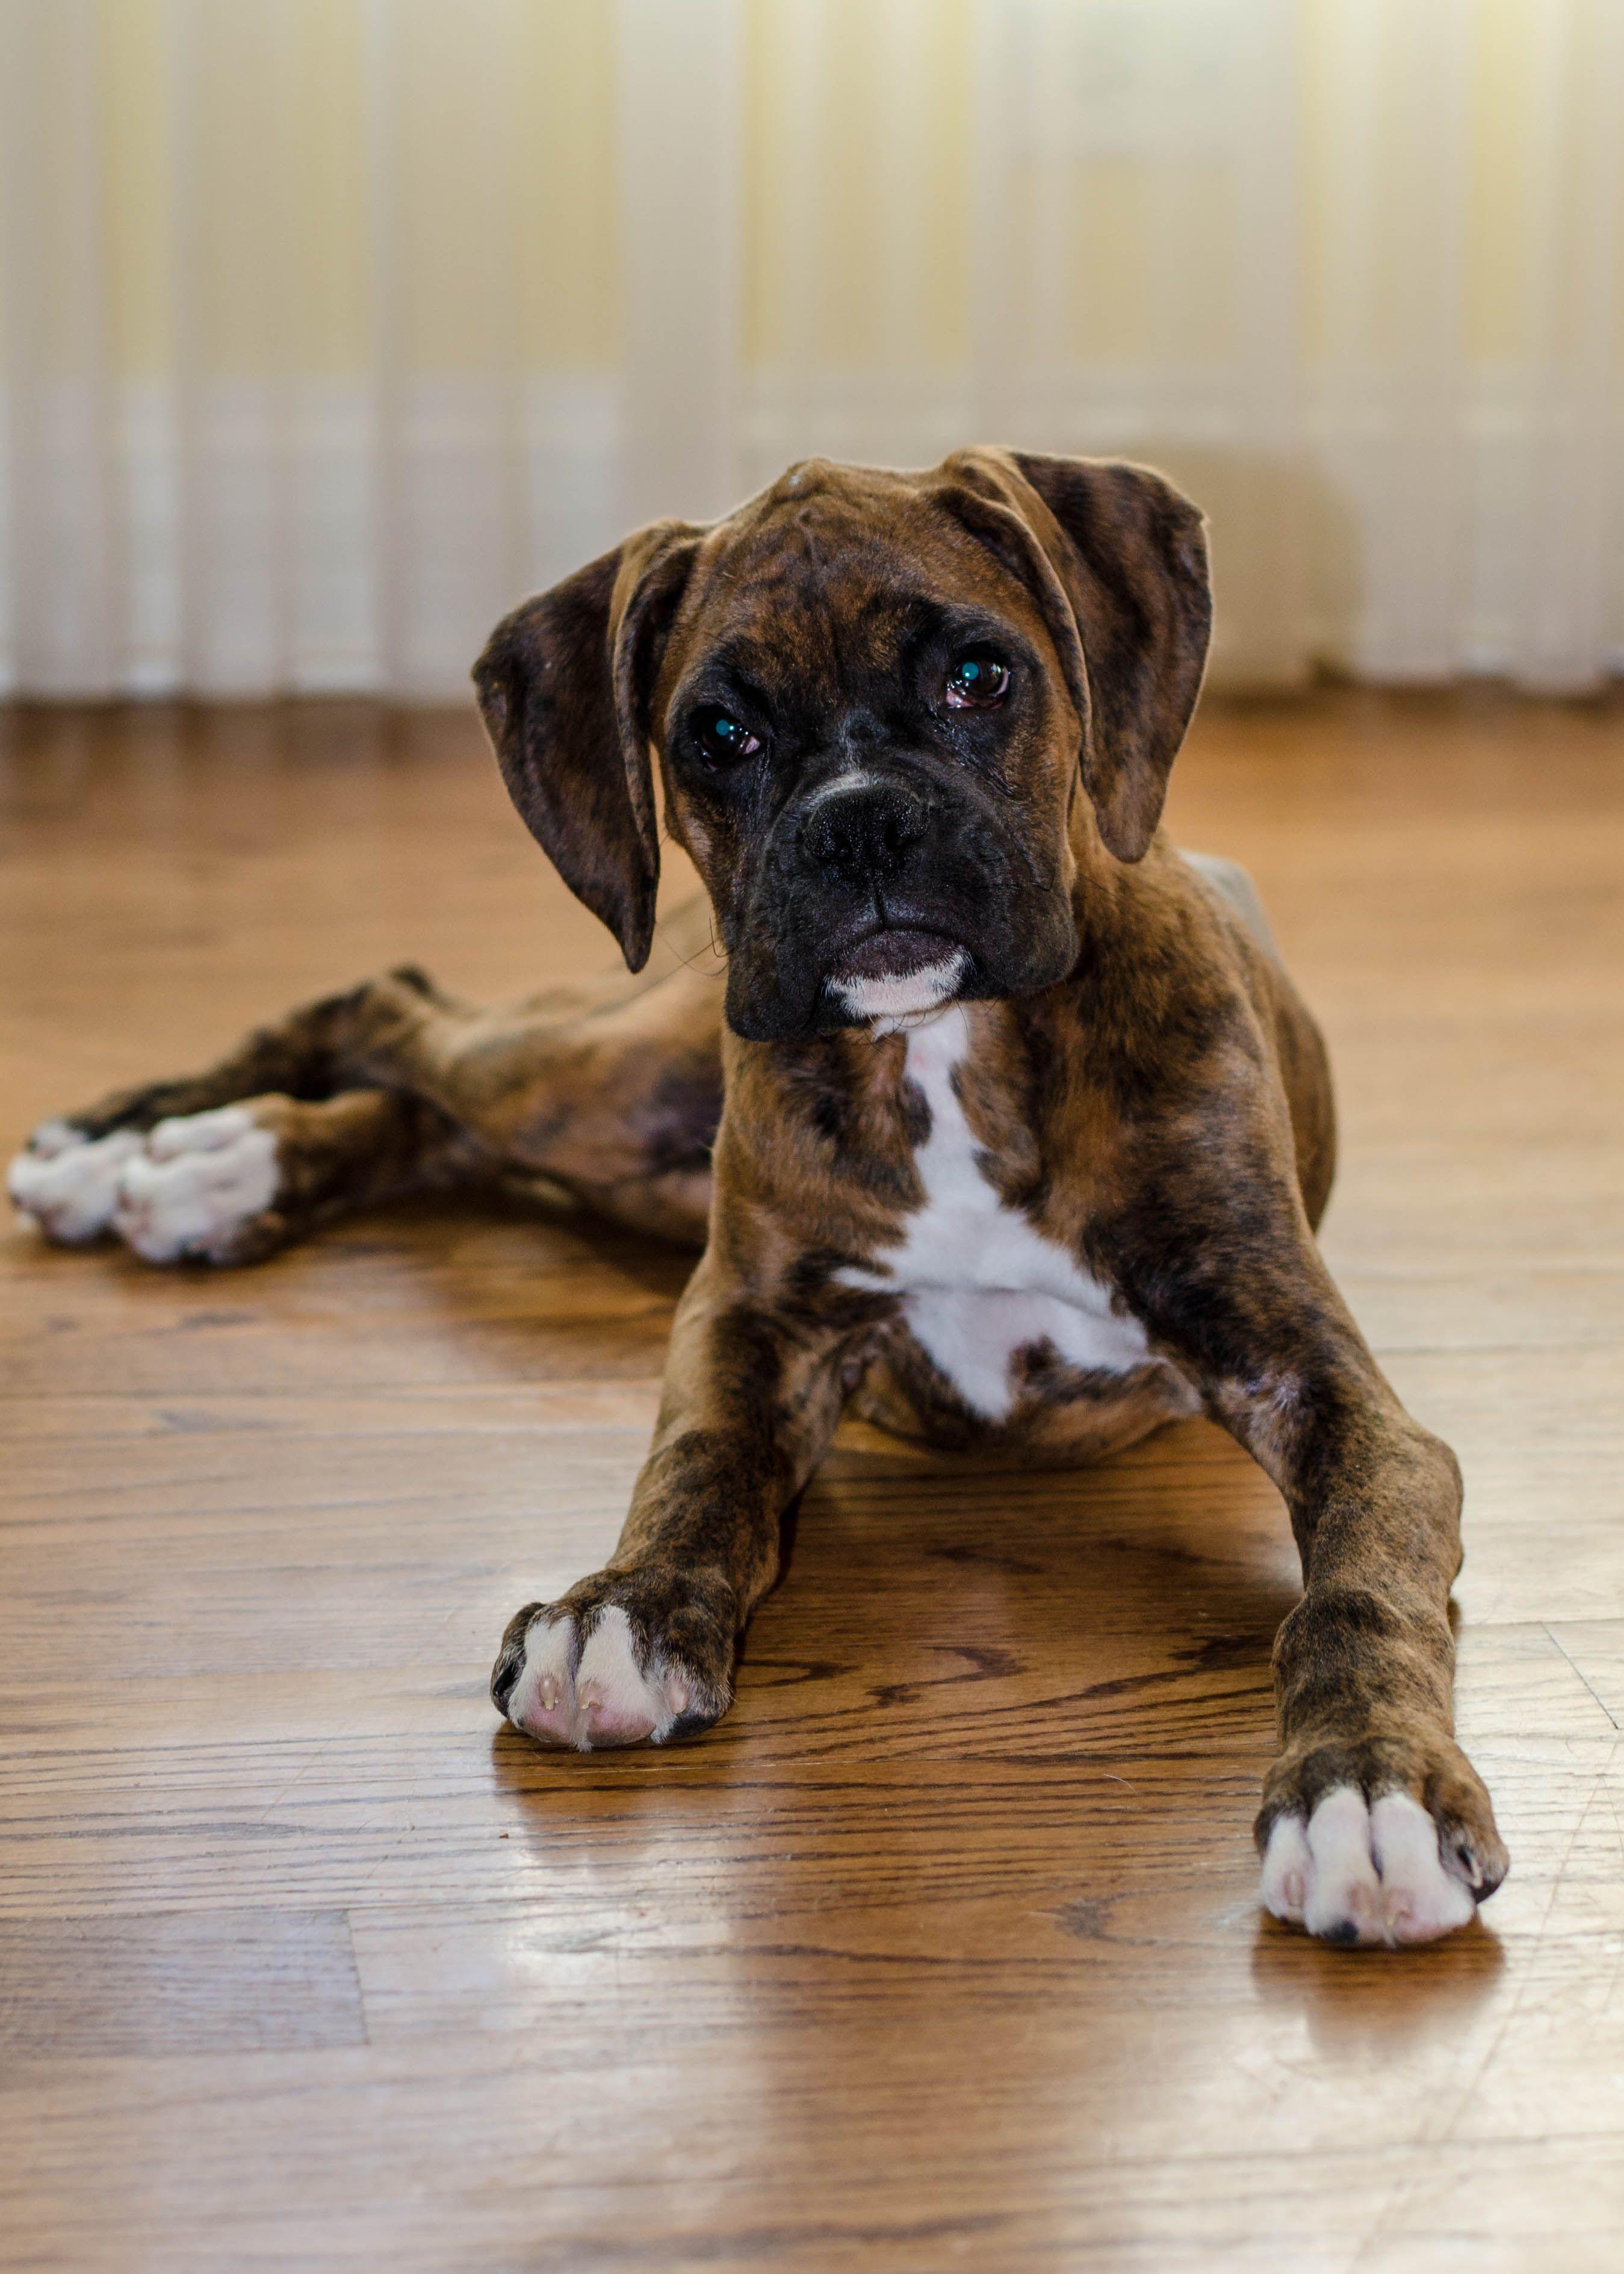 frito the 3 month old boxer puppy boarding school graduates